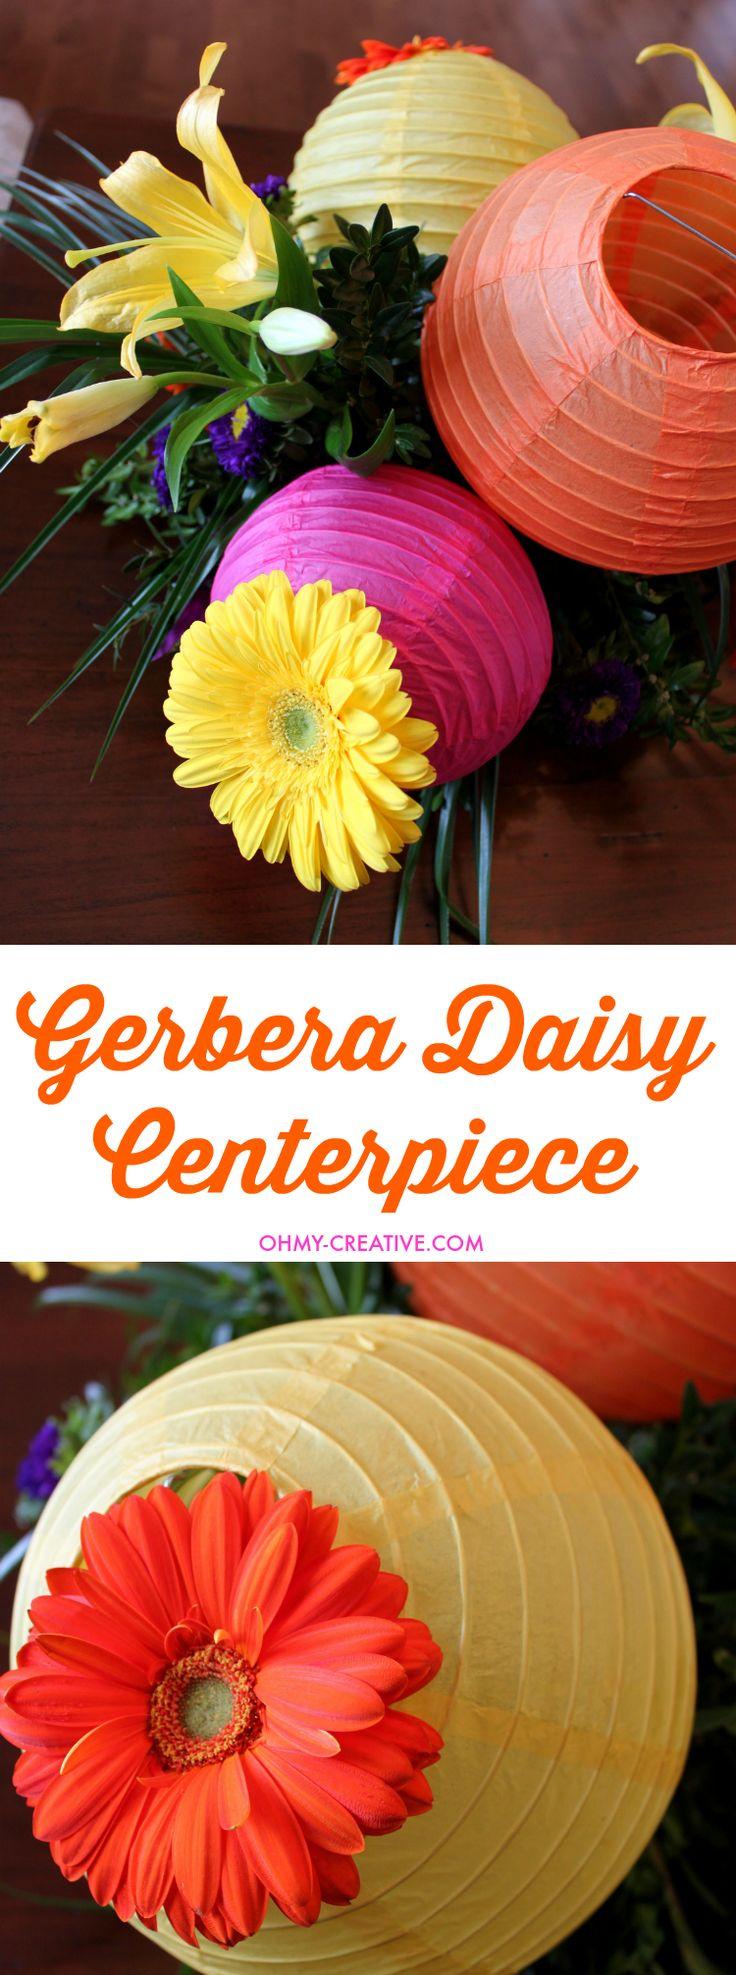 Gerbera daisies are one of my favorite